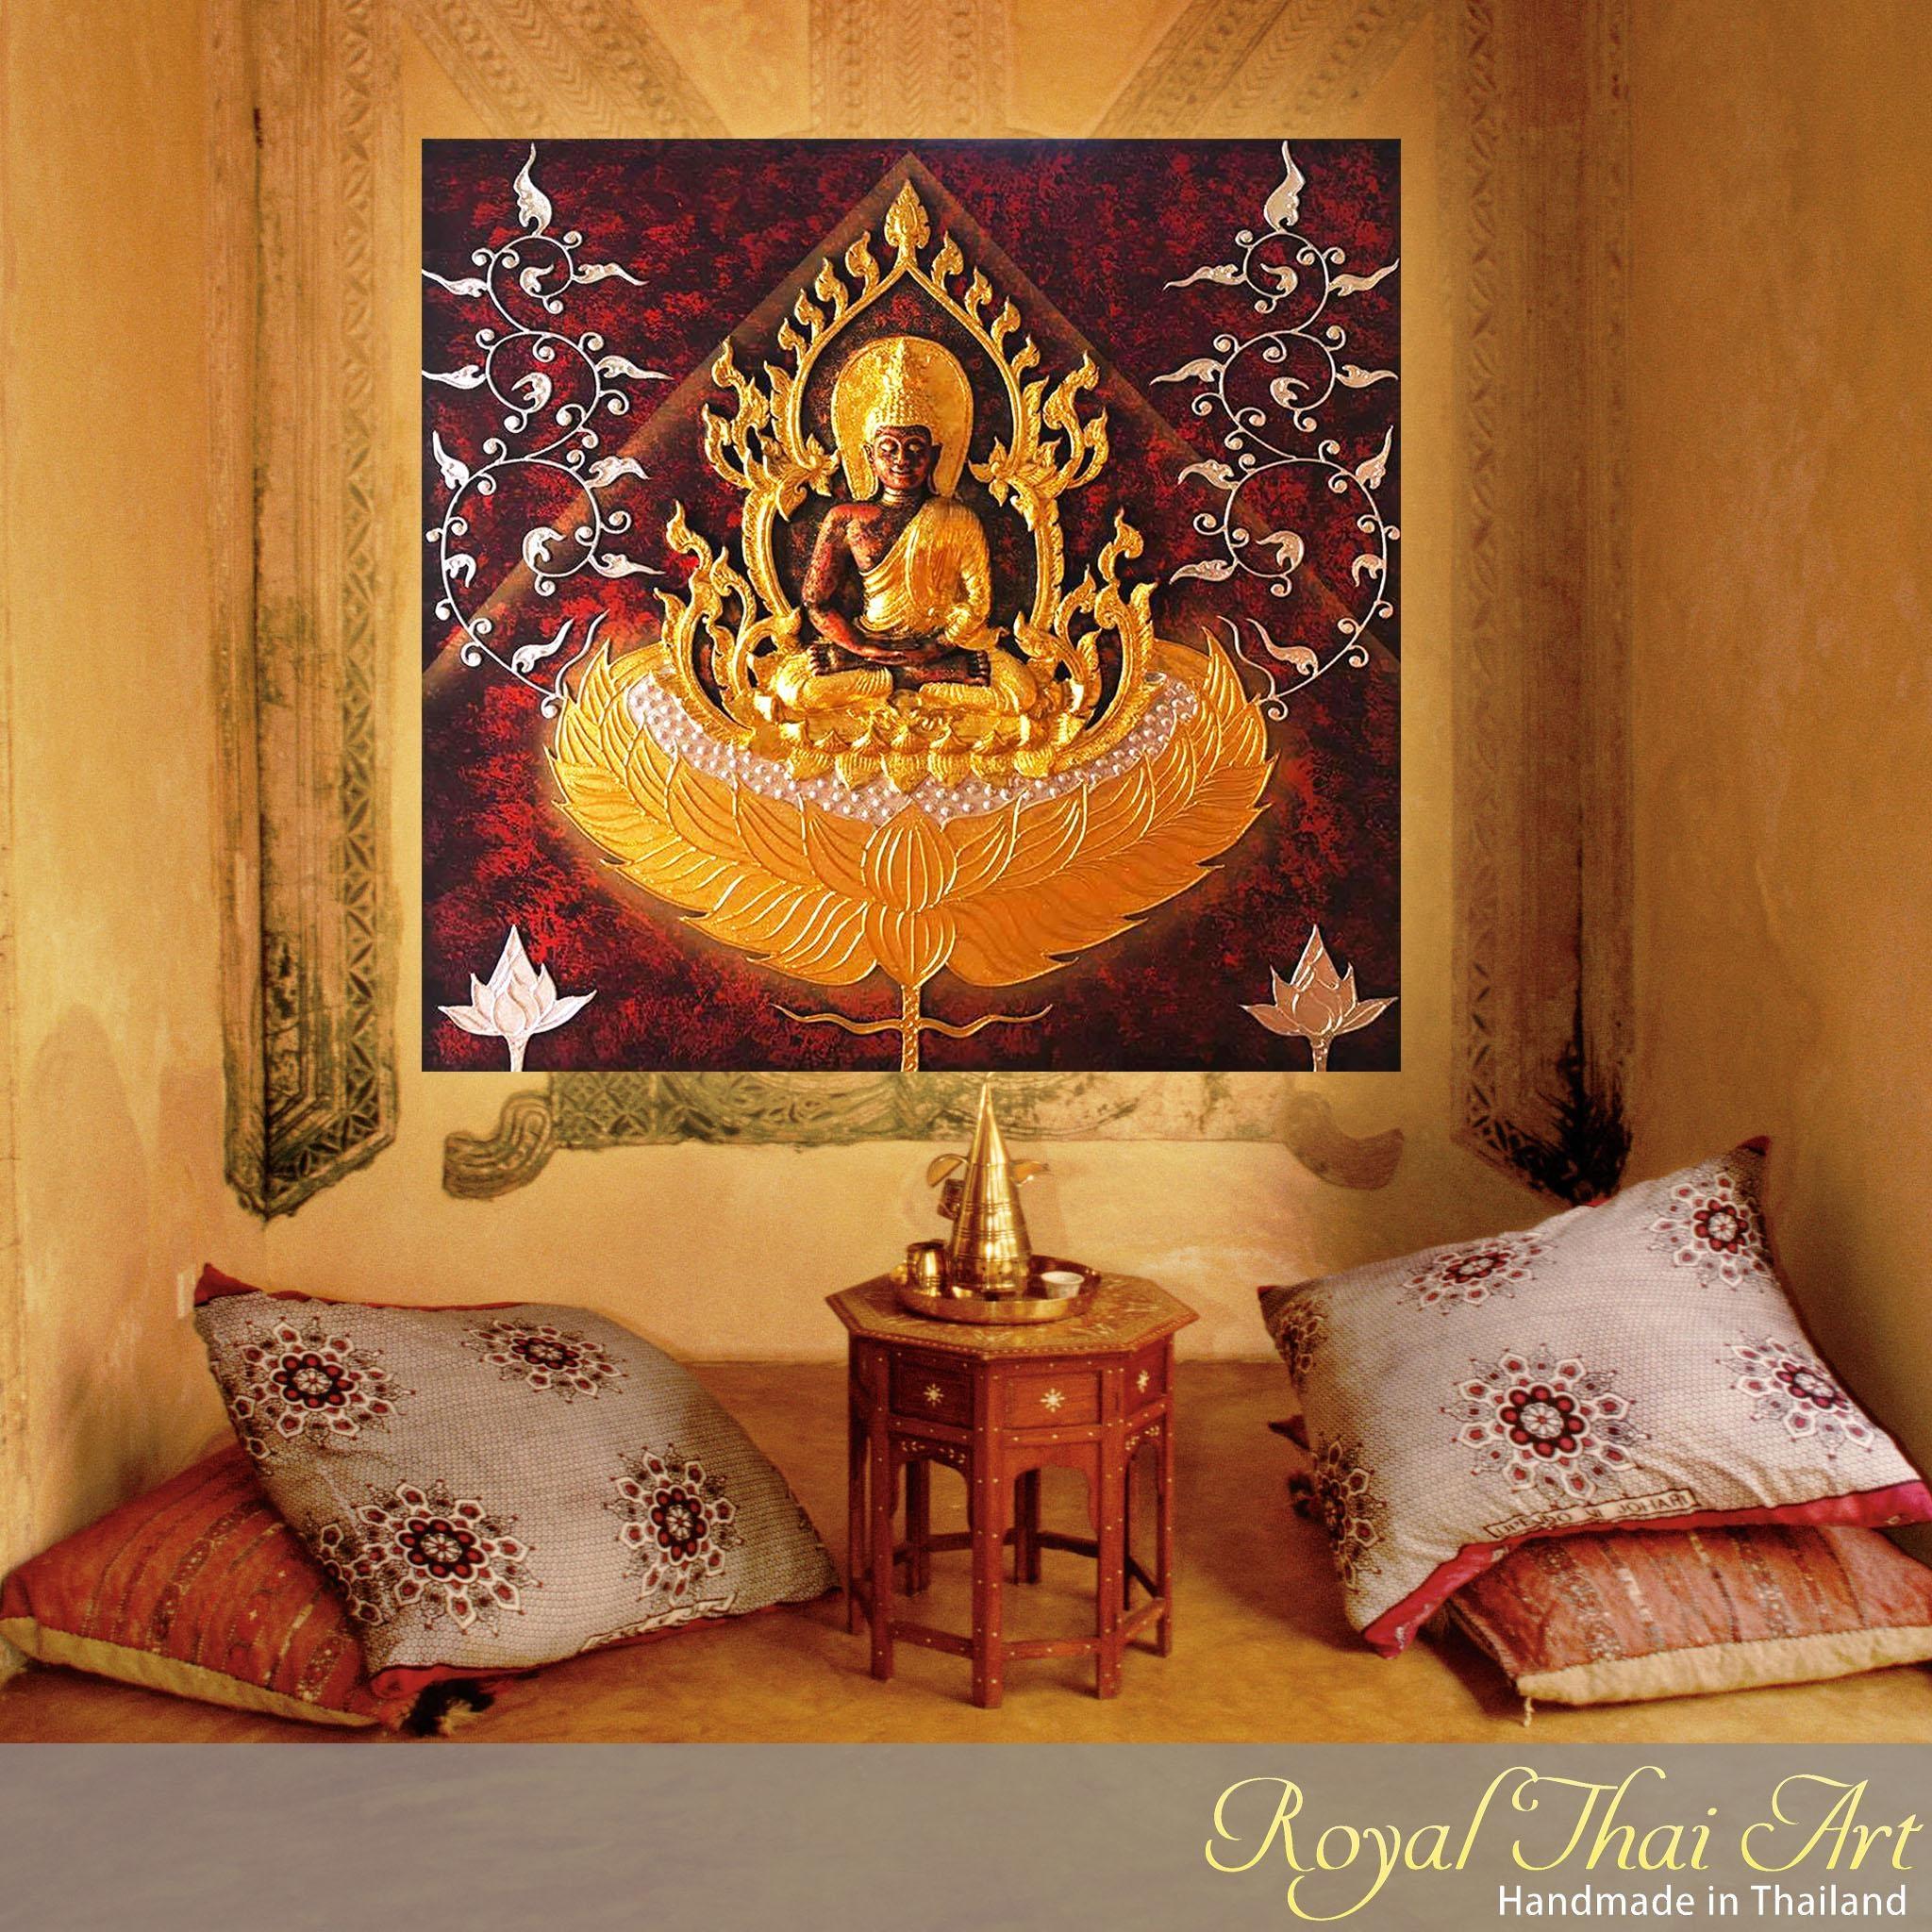 Buddha Painting 3D Handmade Gold Statue | Royal Thai Art With Buddha Wooden Wall Art (View 15 of 20)